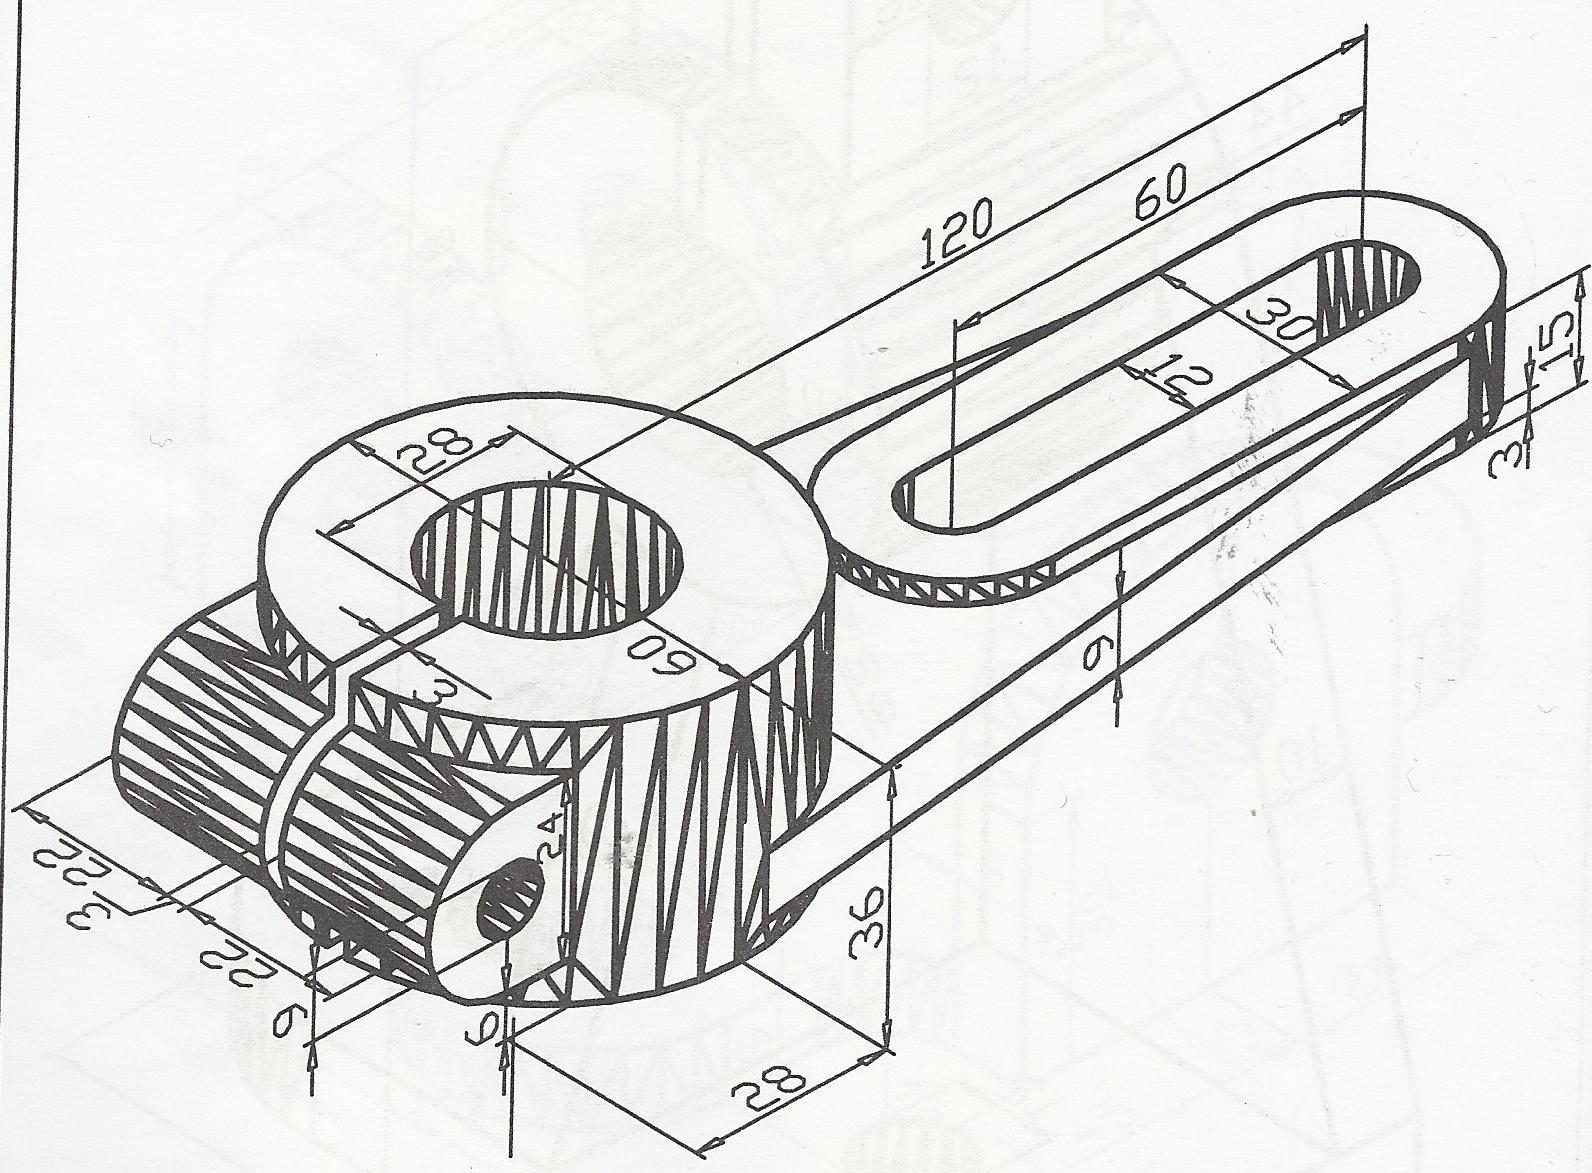 tutorial 15 3d engineering drawing 2 auto cad grabcad